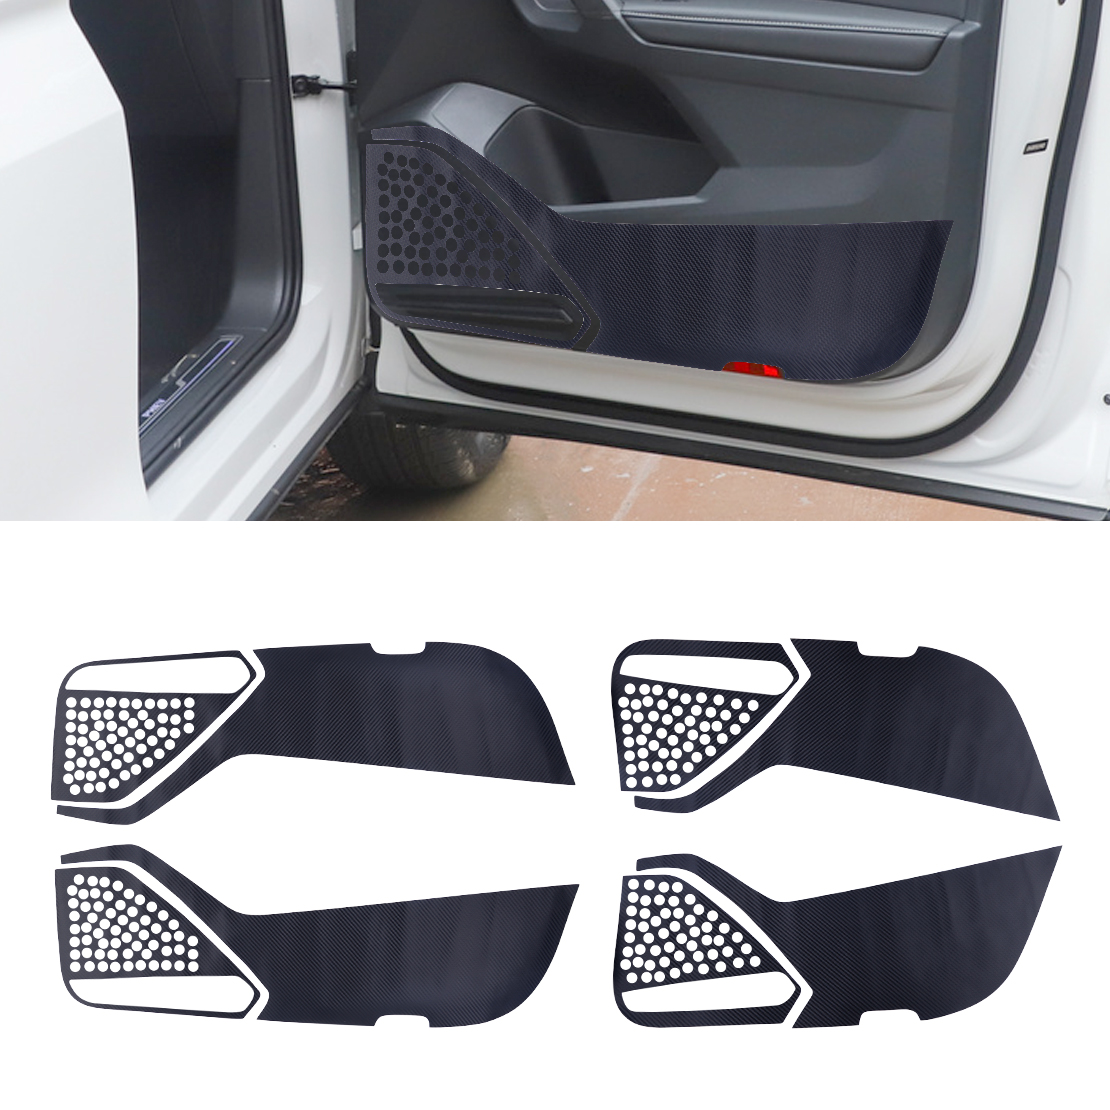 4pcs Car Front & Rear Door Protection Anti-Kick Pad Vinyl Mat Sticker Fit For VW Tiguan 2017 2018